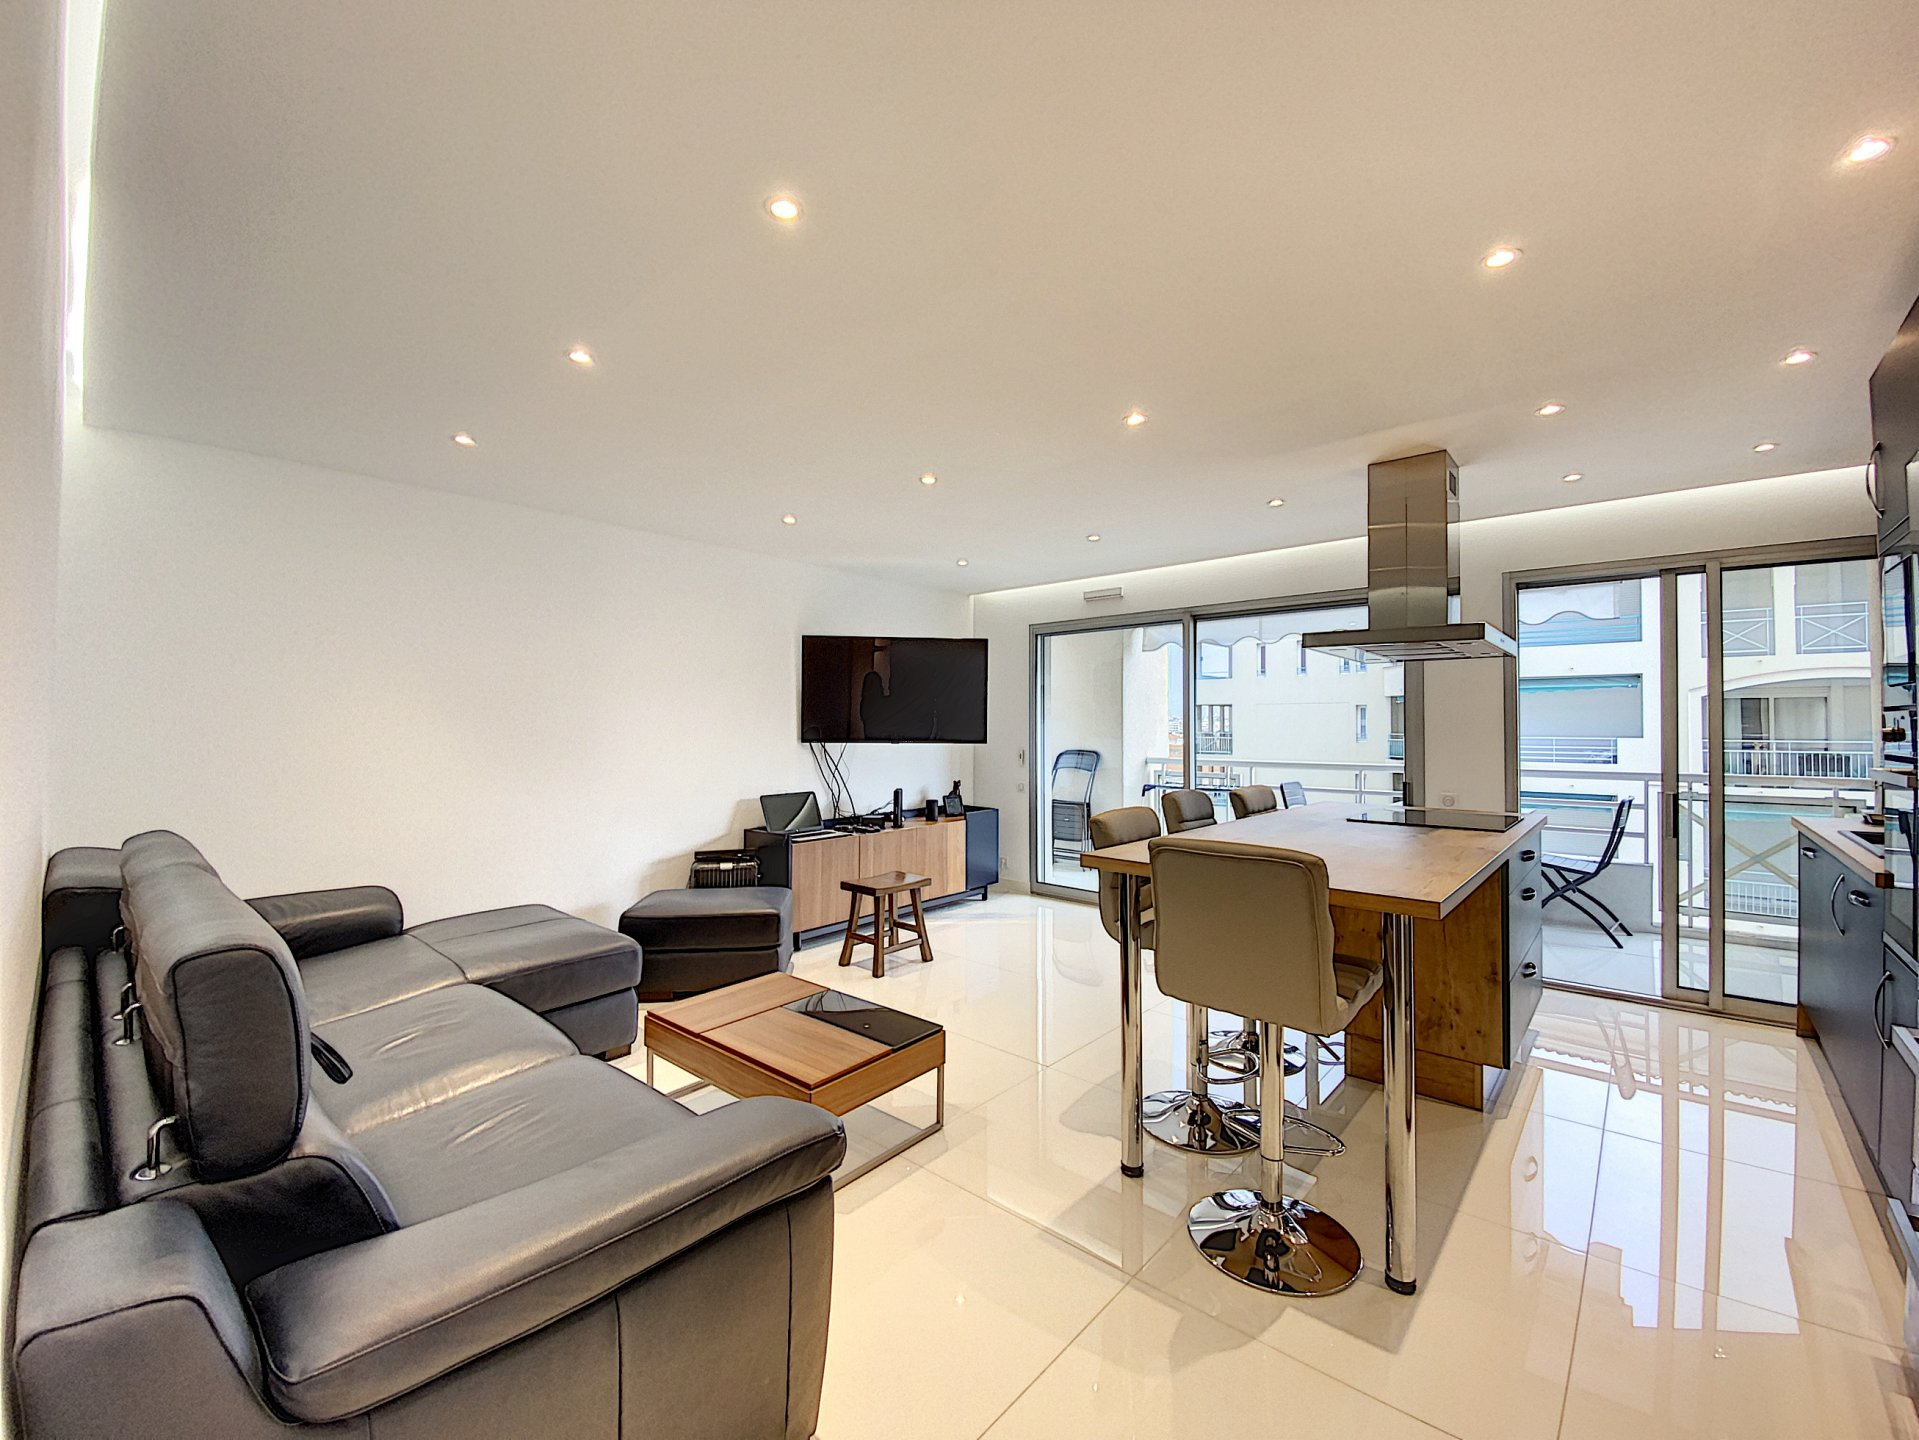 Nice modern apartment